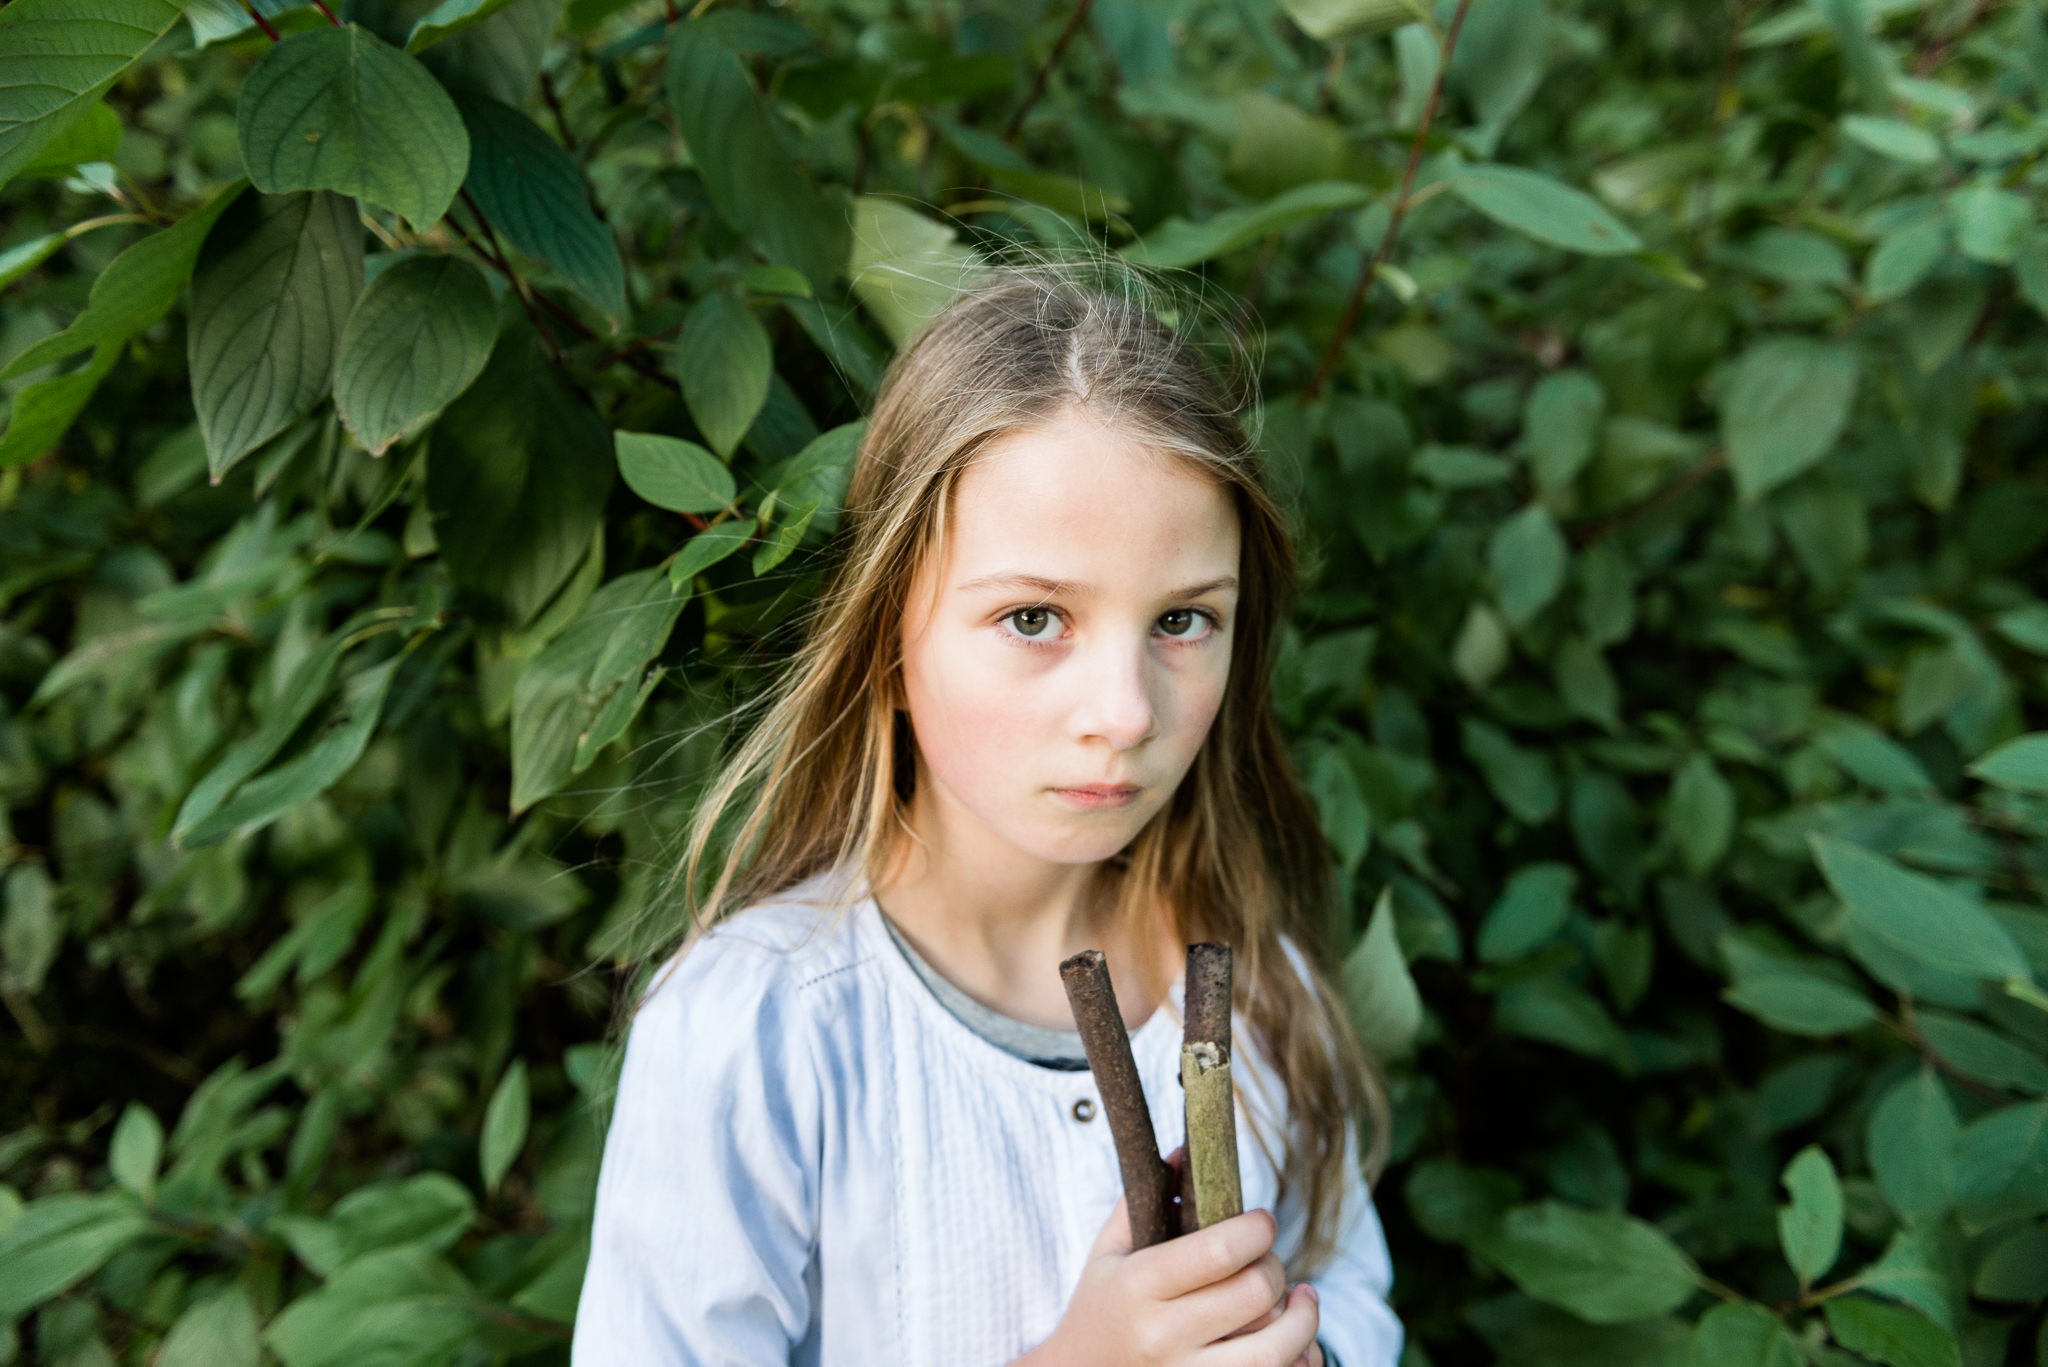 Childhood Photography Lifestyle Child Portraits Kids Children Autumn Outoors - Jenny Harper-19.jpg